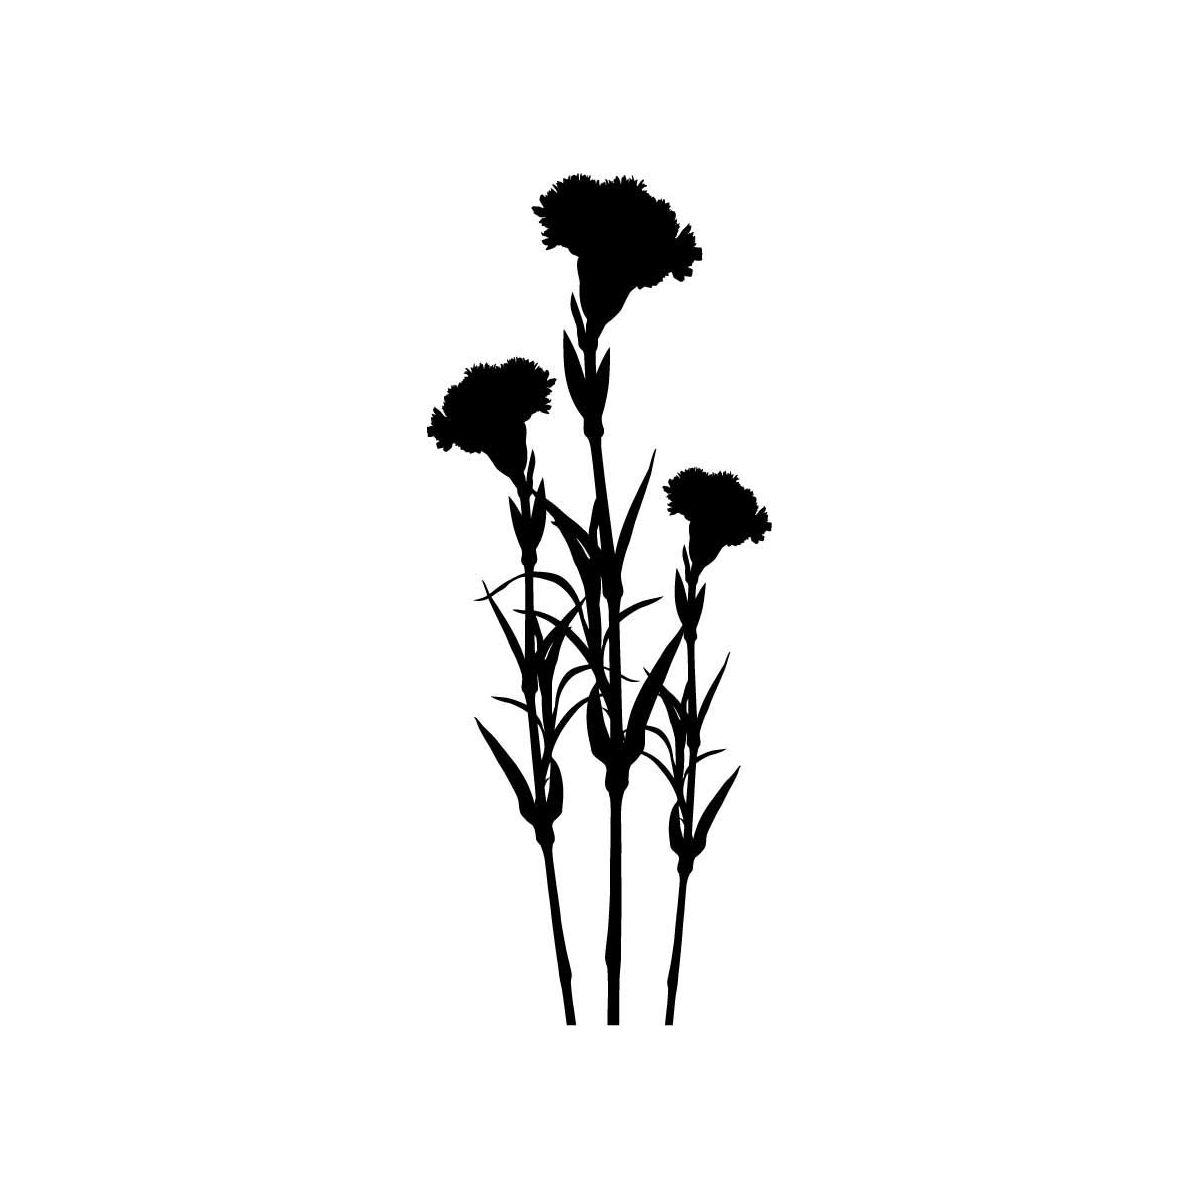 Carnation flowers sticker wallflower silhouettes